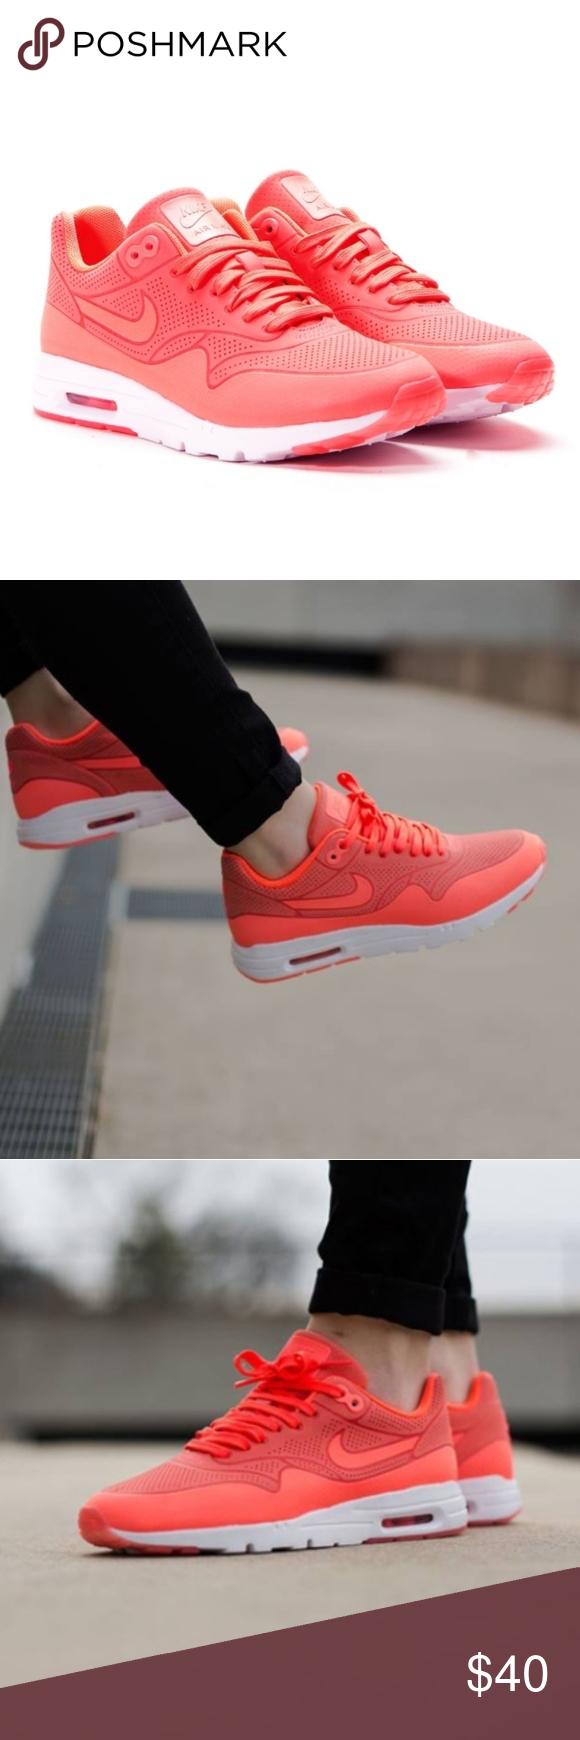 Women Nike Air Max 1 Ultra Moire Sneakers on Poshmark